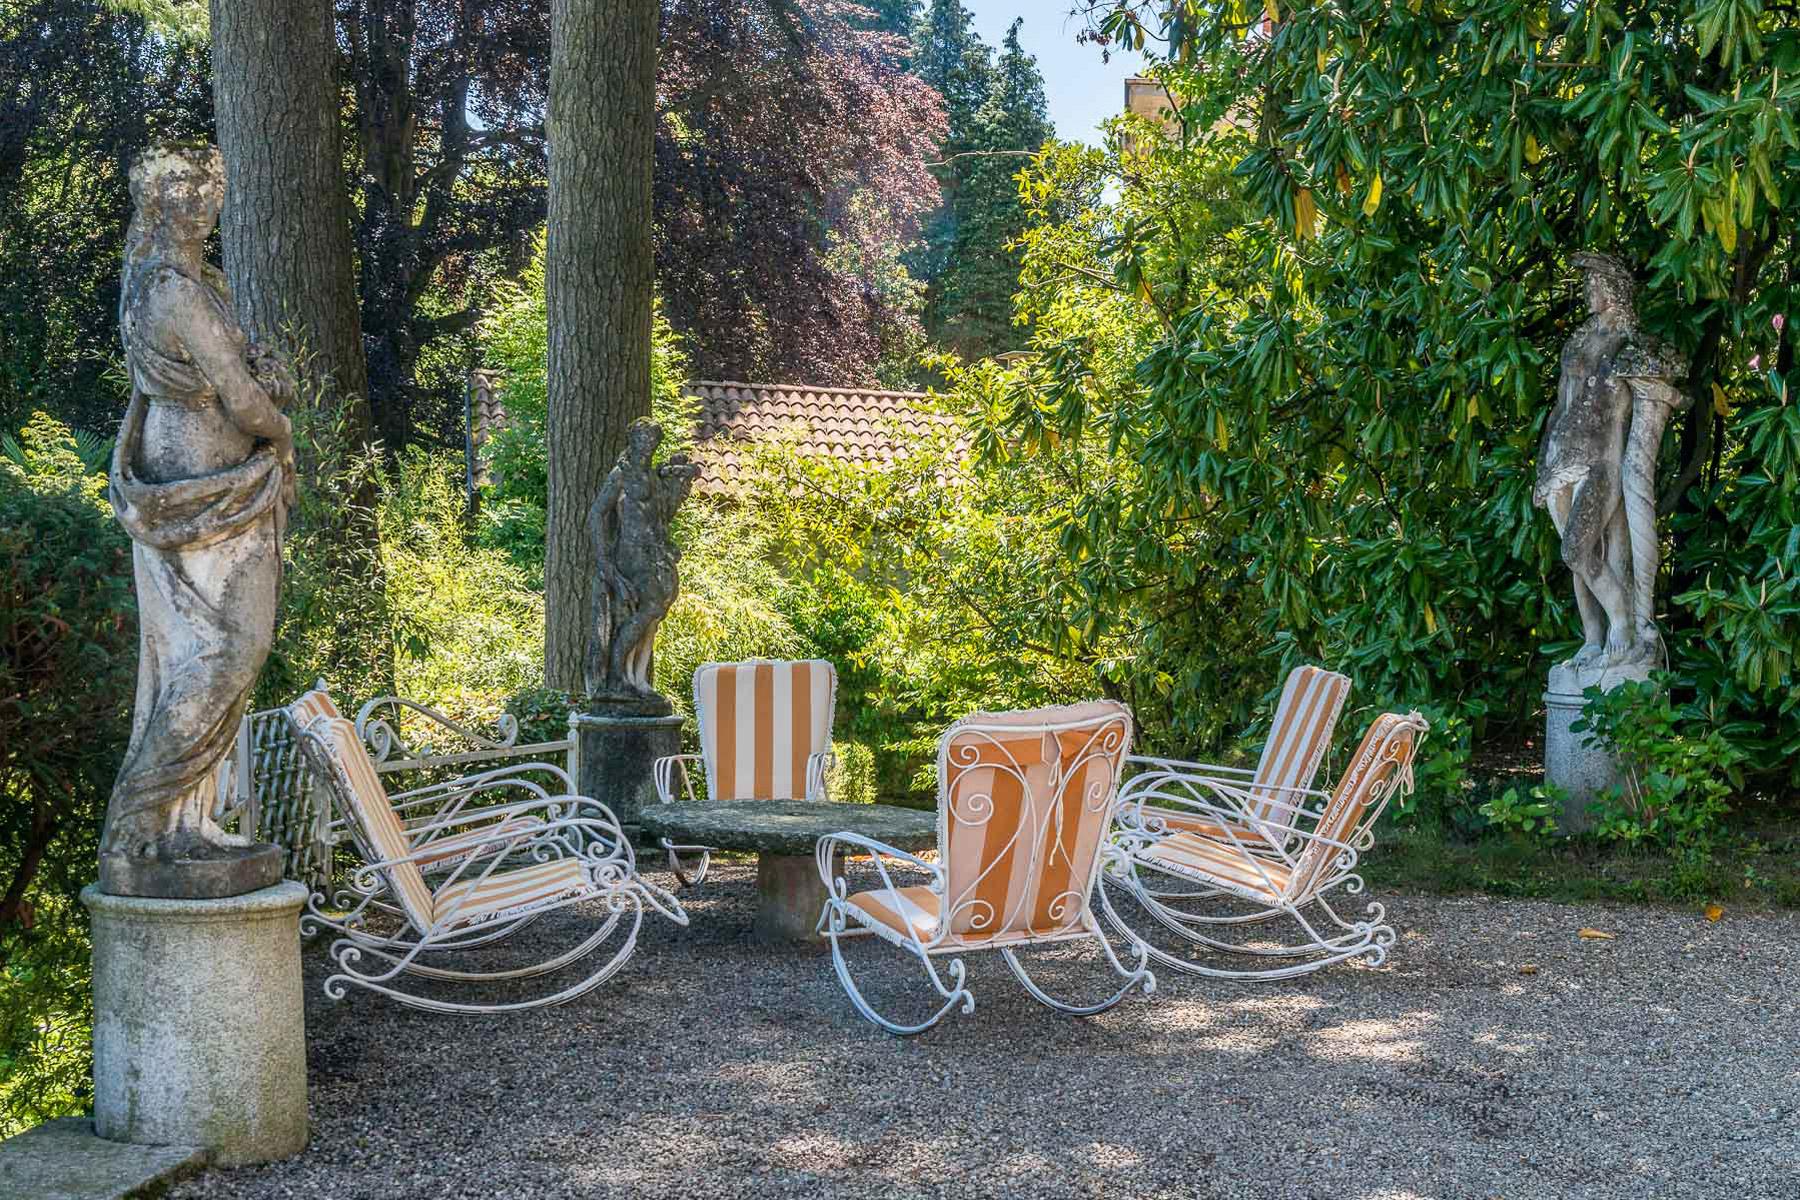 Additional photo for property listing at Enchanting Villa overlooking Orta Lake Via Pietro Durio Pella, Novara 28010 Italia